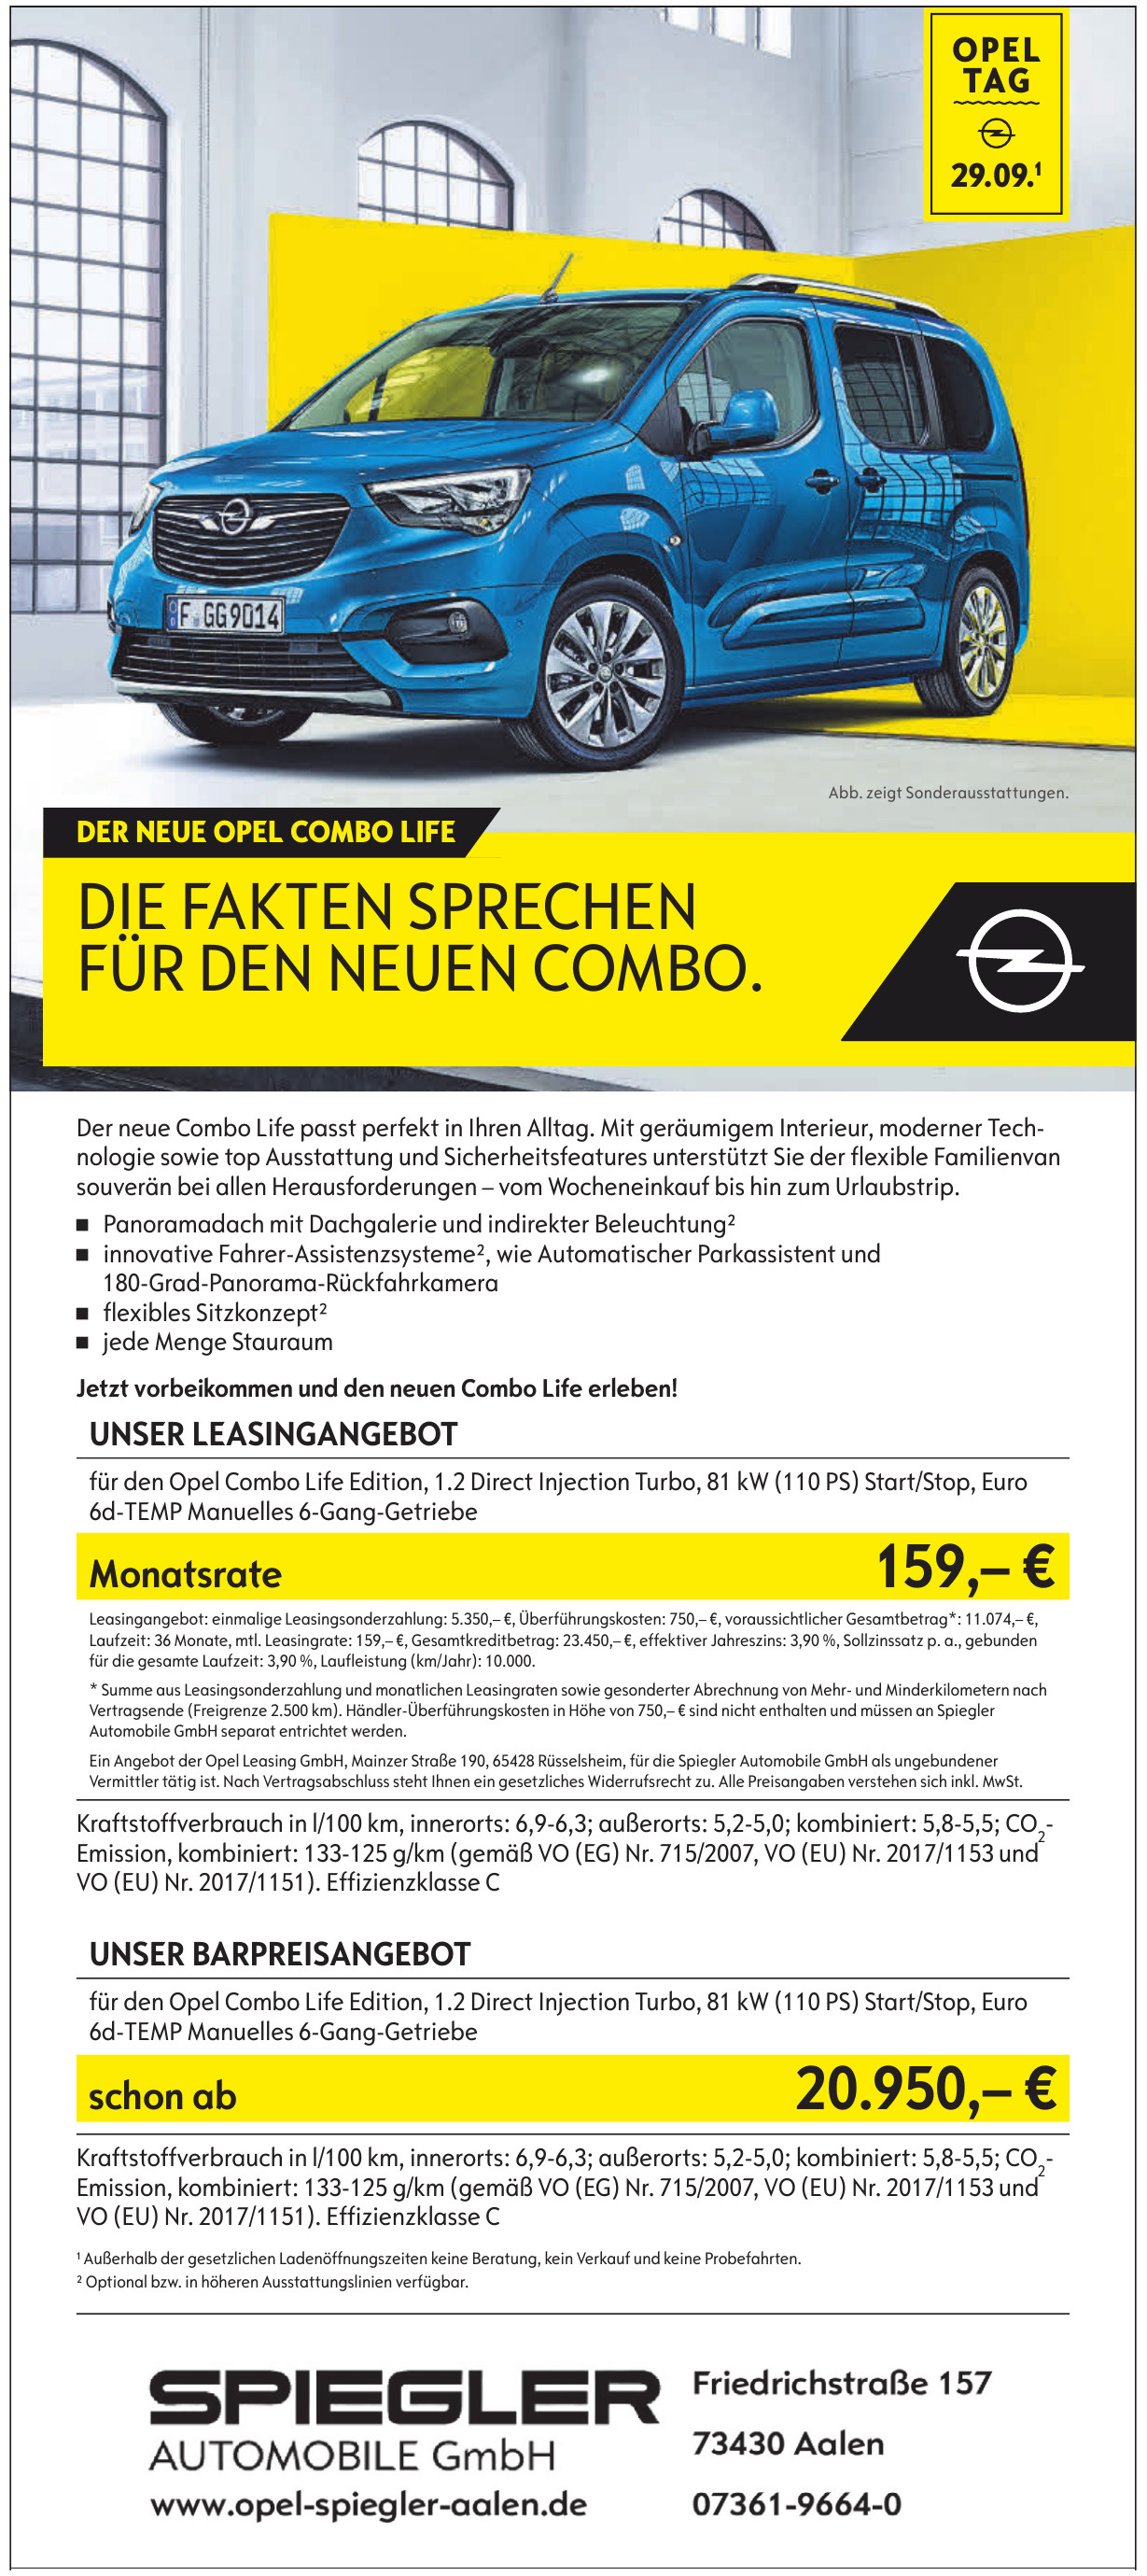 Spiegler Automobil GmbH